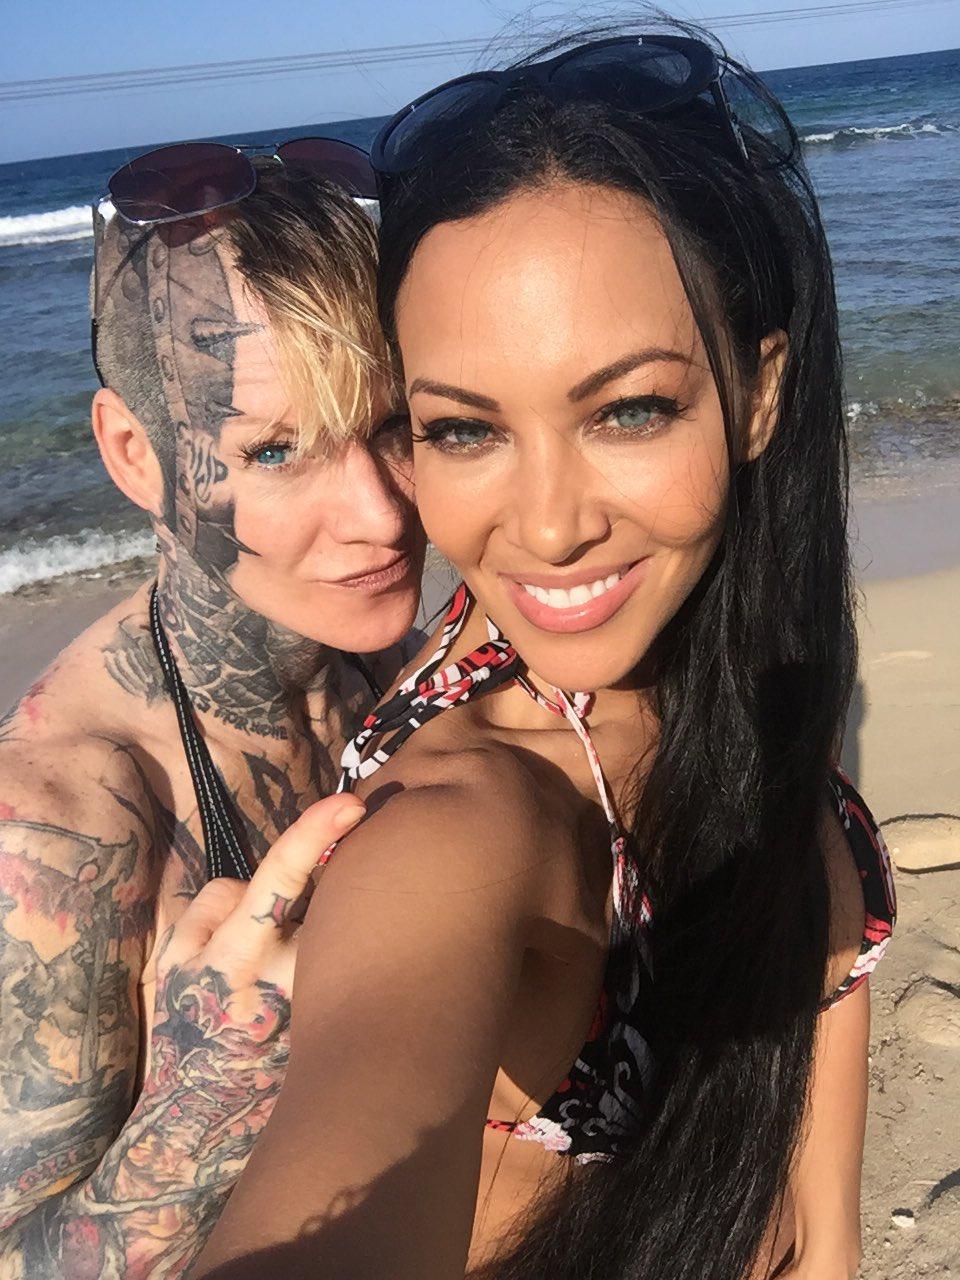 Carla Harvey en Twitter: 😎🌞hadnt put my toes in the sand